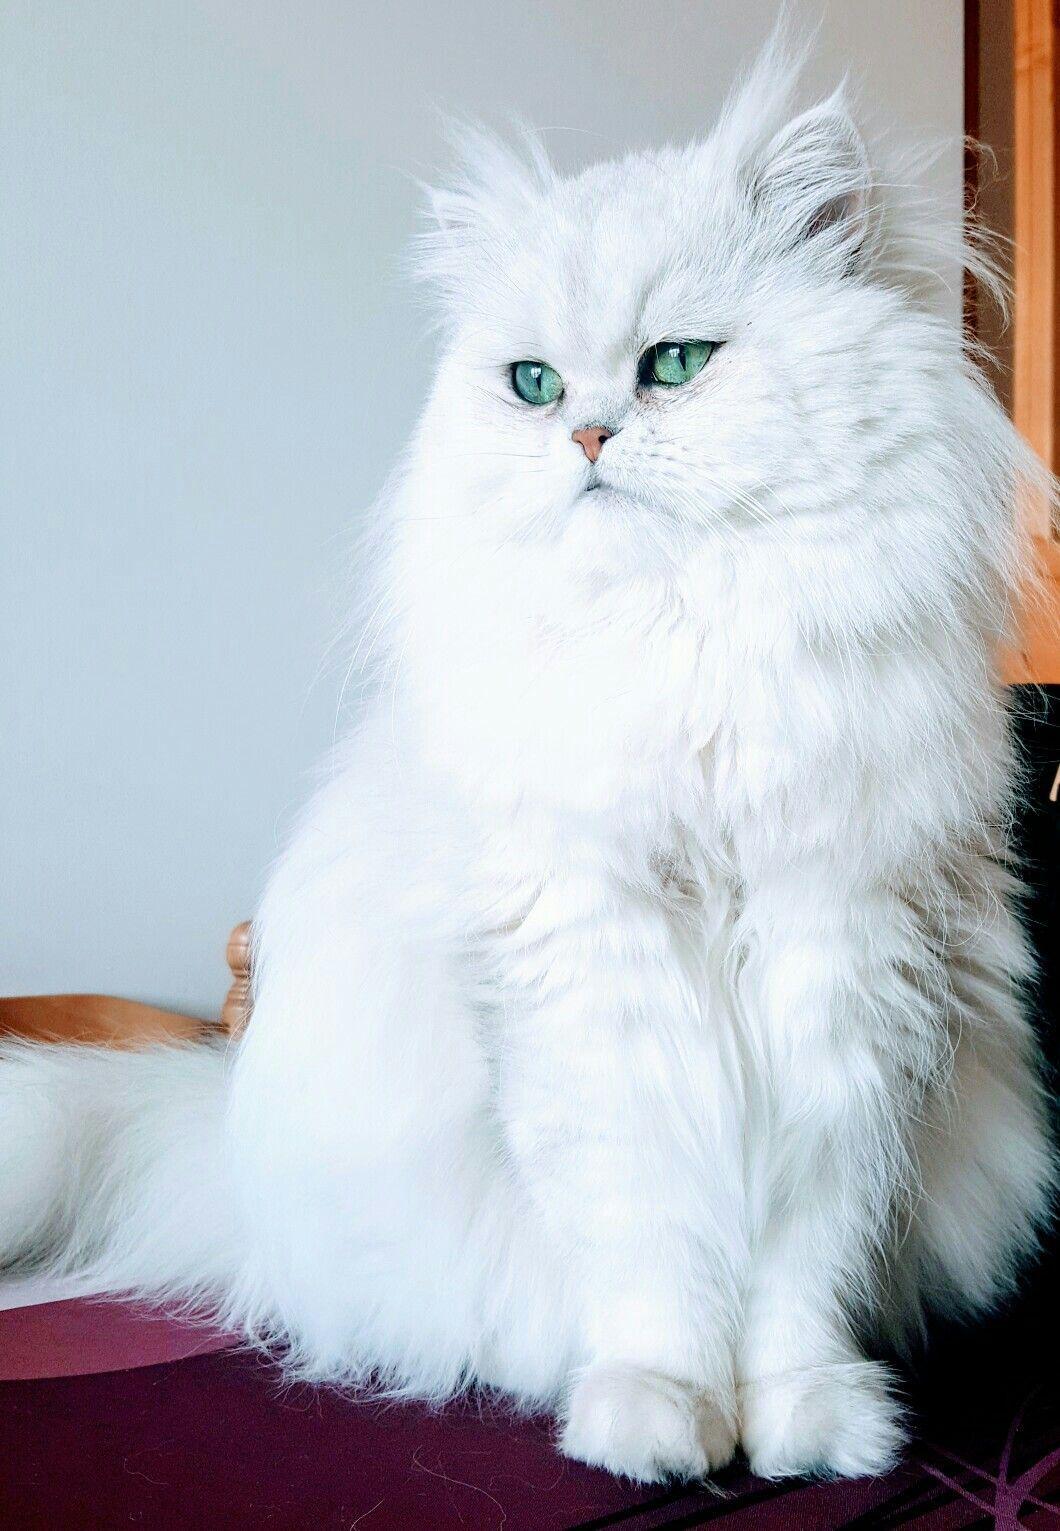 My Amazing Persian Prince Whitekittens Persian Cat White Pretty Cats White Persian Kittens